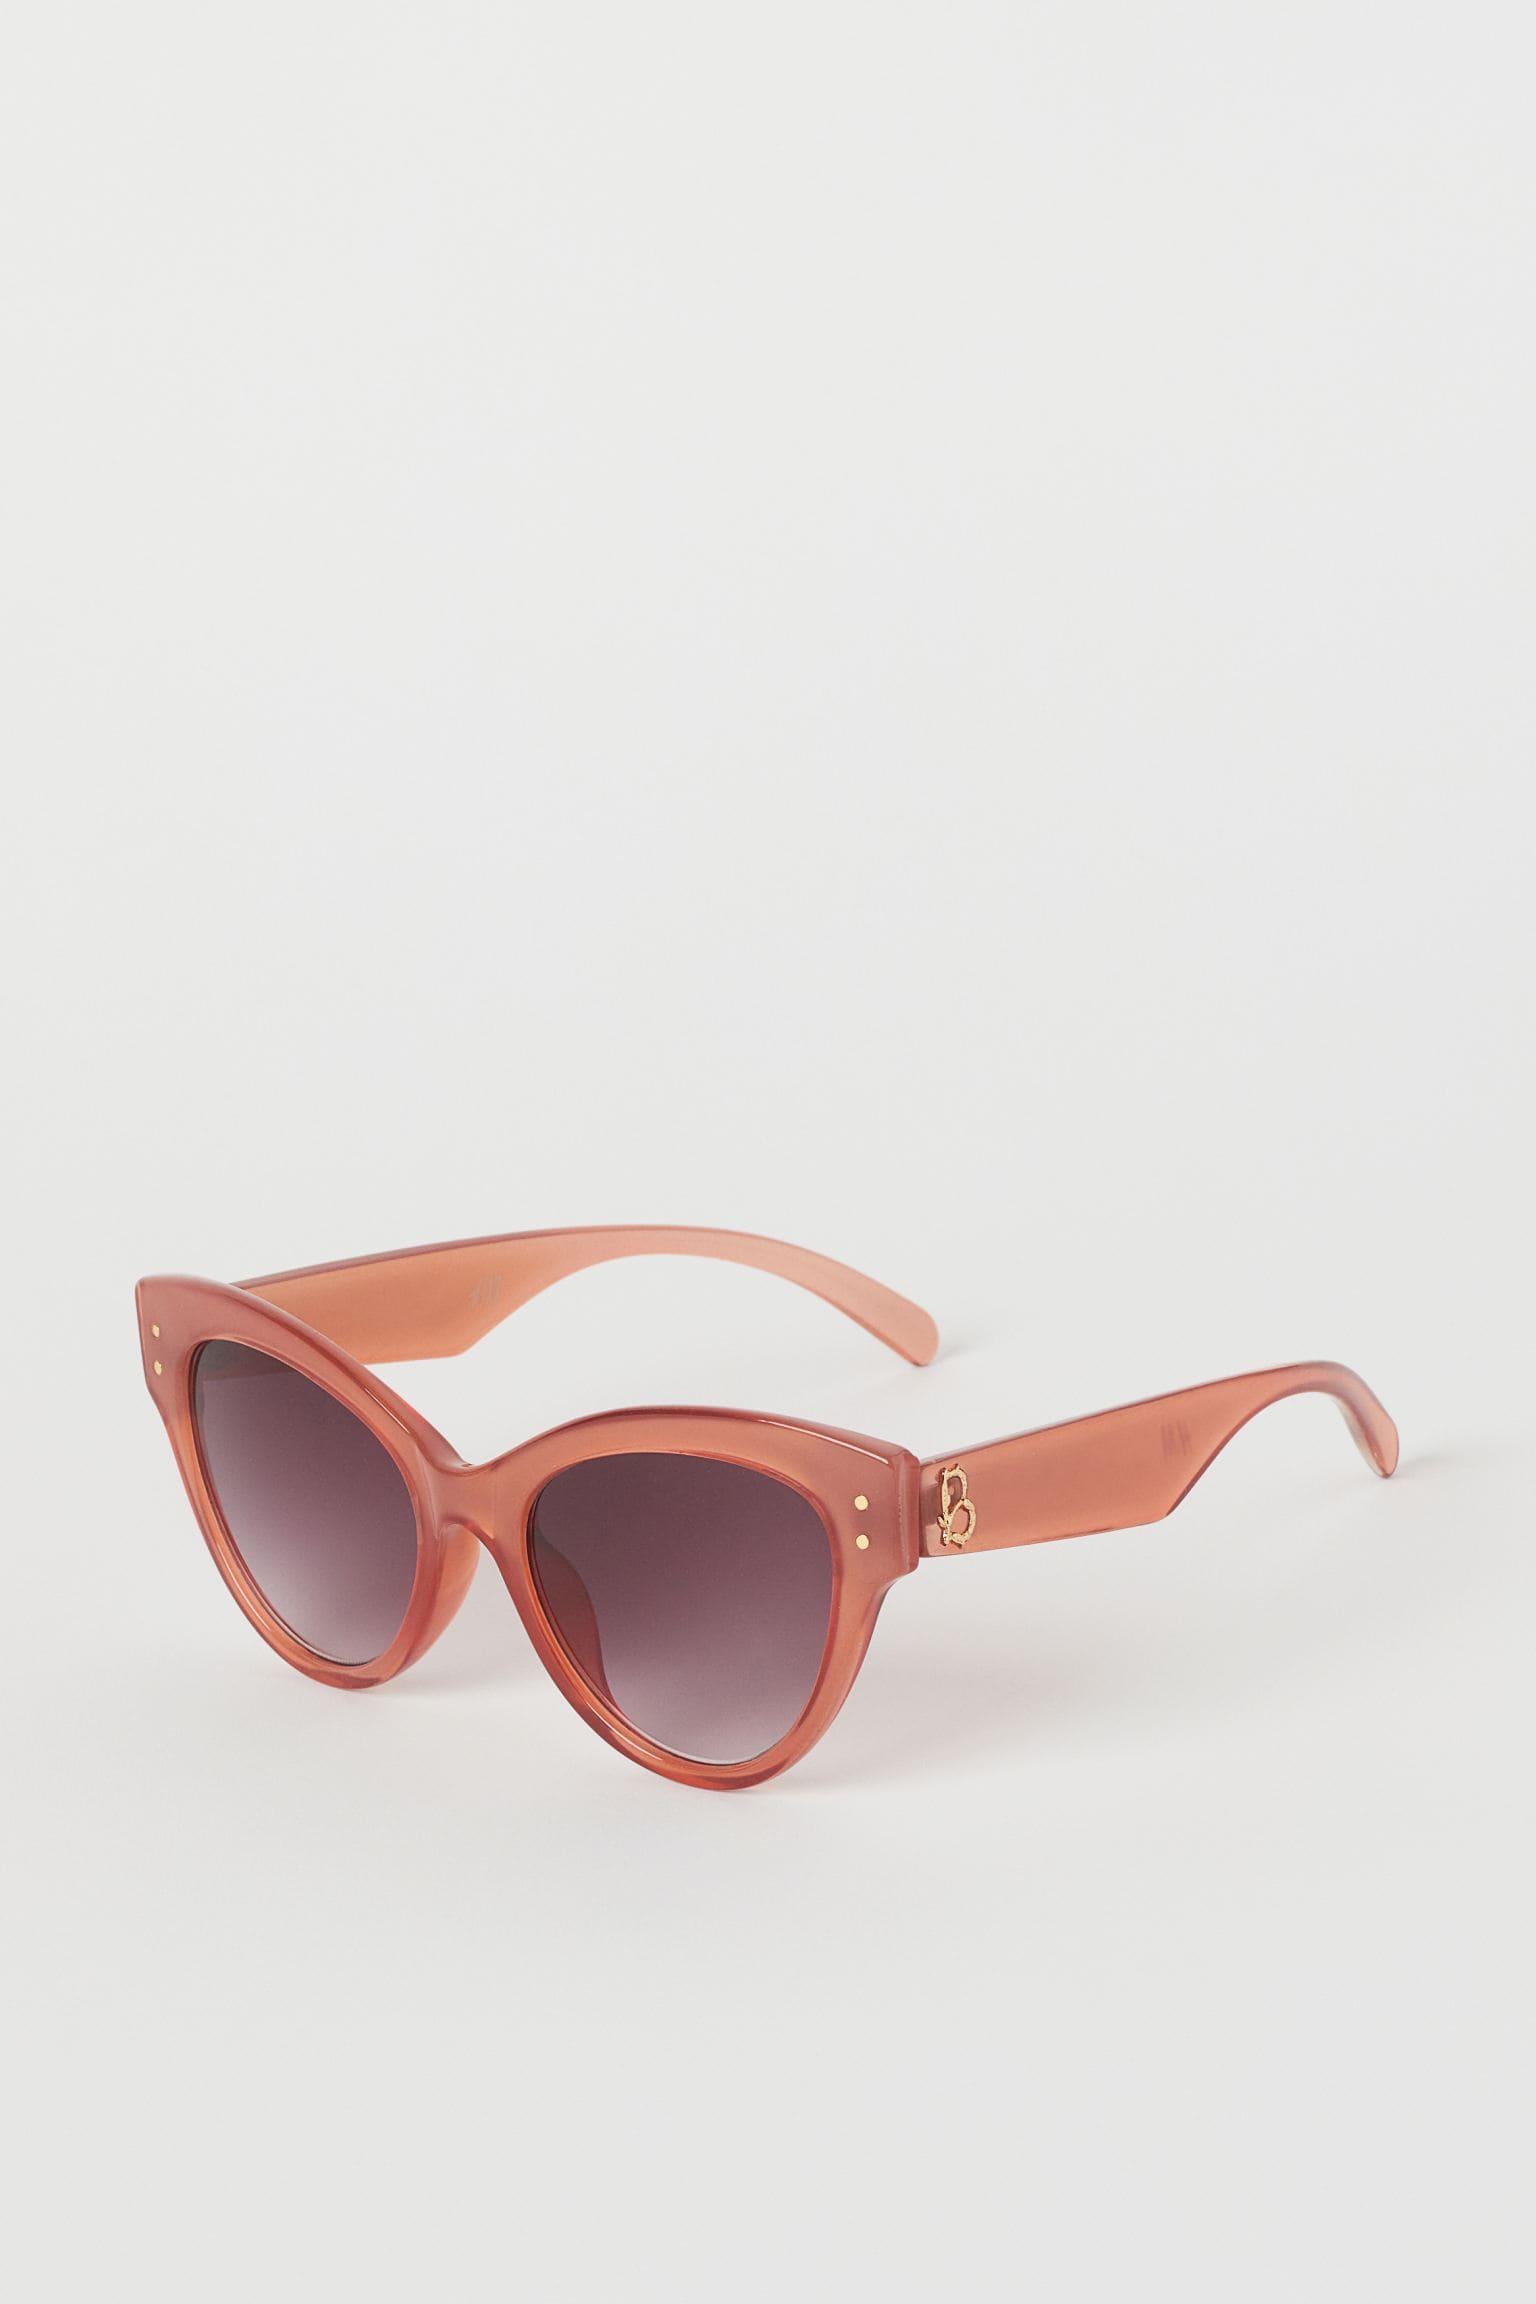 Gammelrosa solglasögon från Brock Collection x H&M